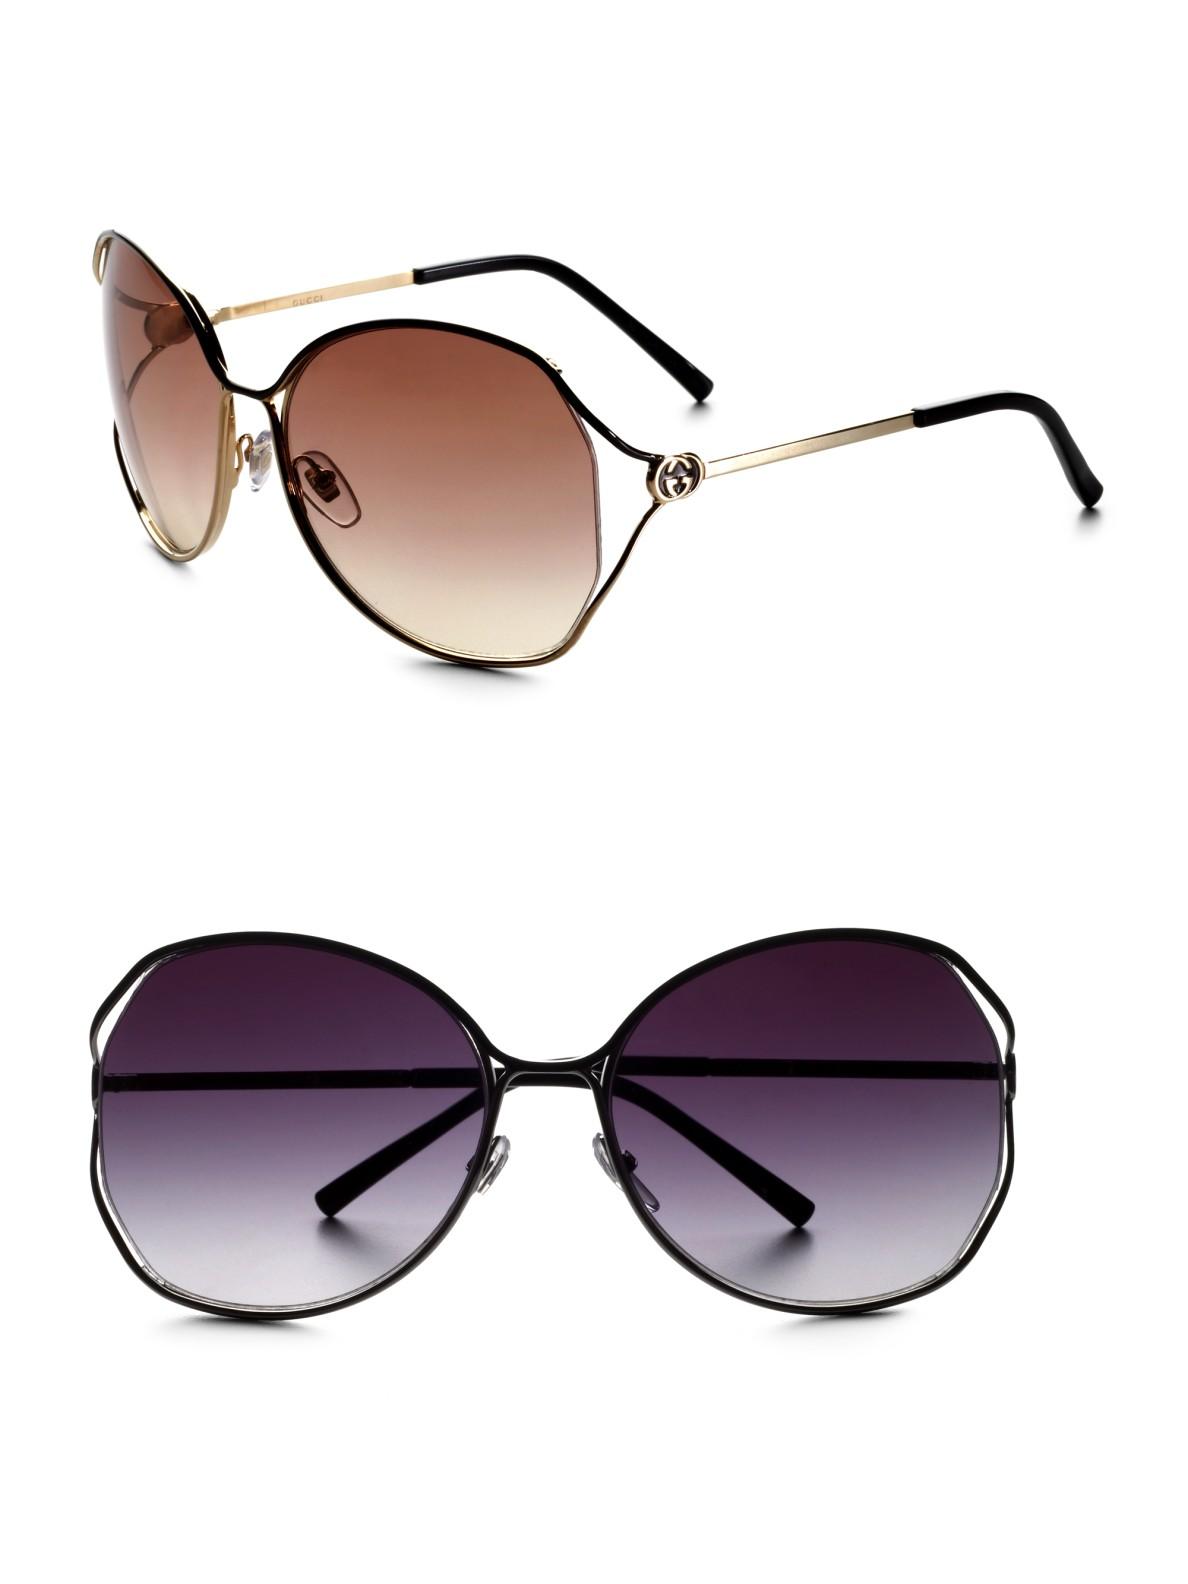 fb0e1a51ee31 Gucci Oversized Metal Sunglasses in Metallic - Lyst